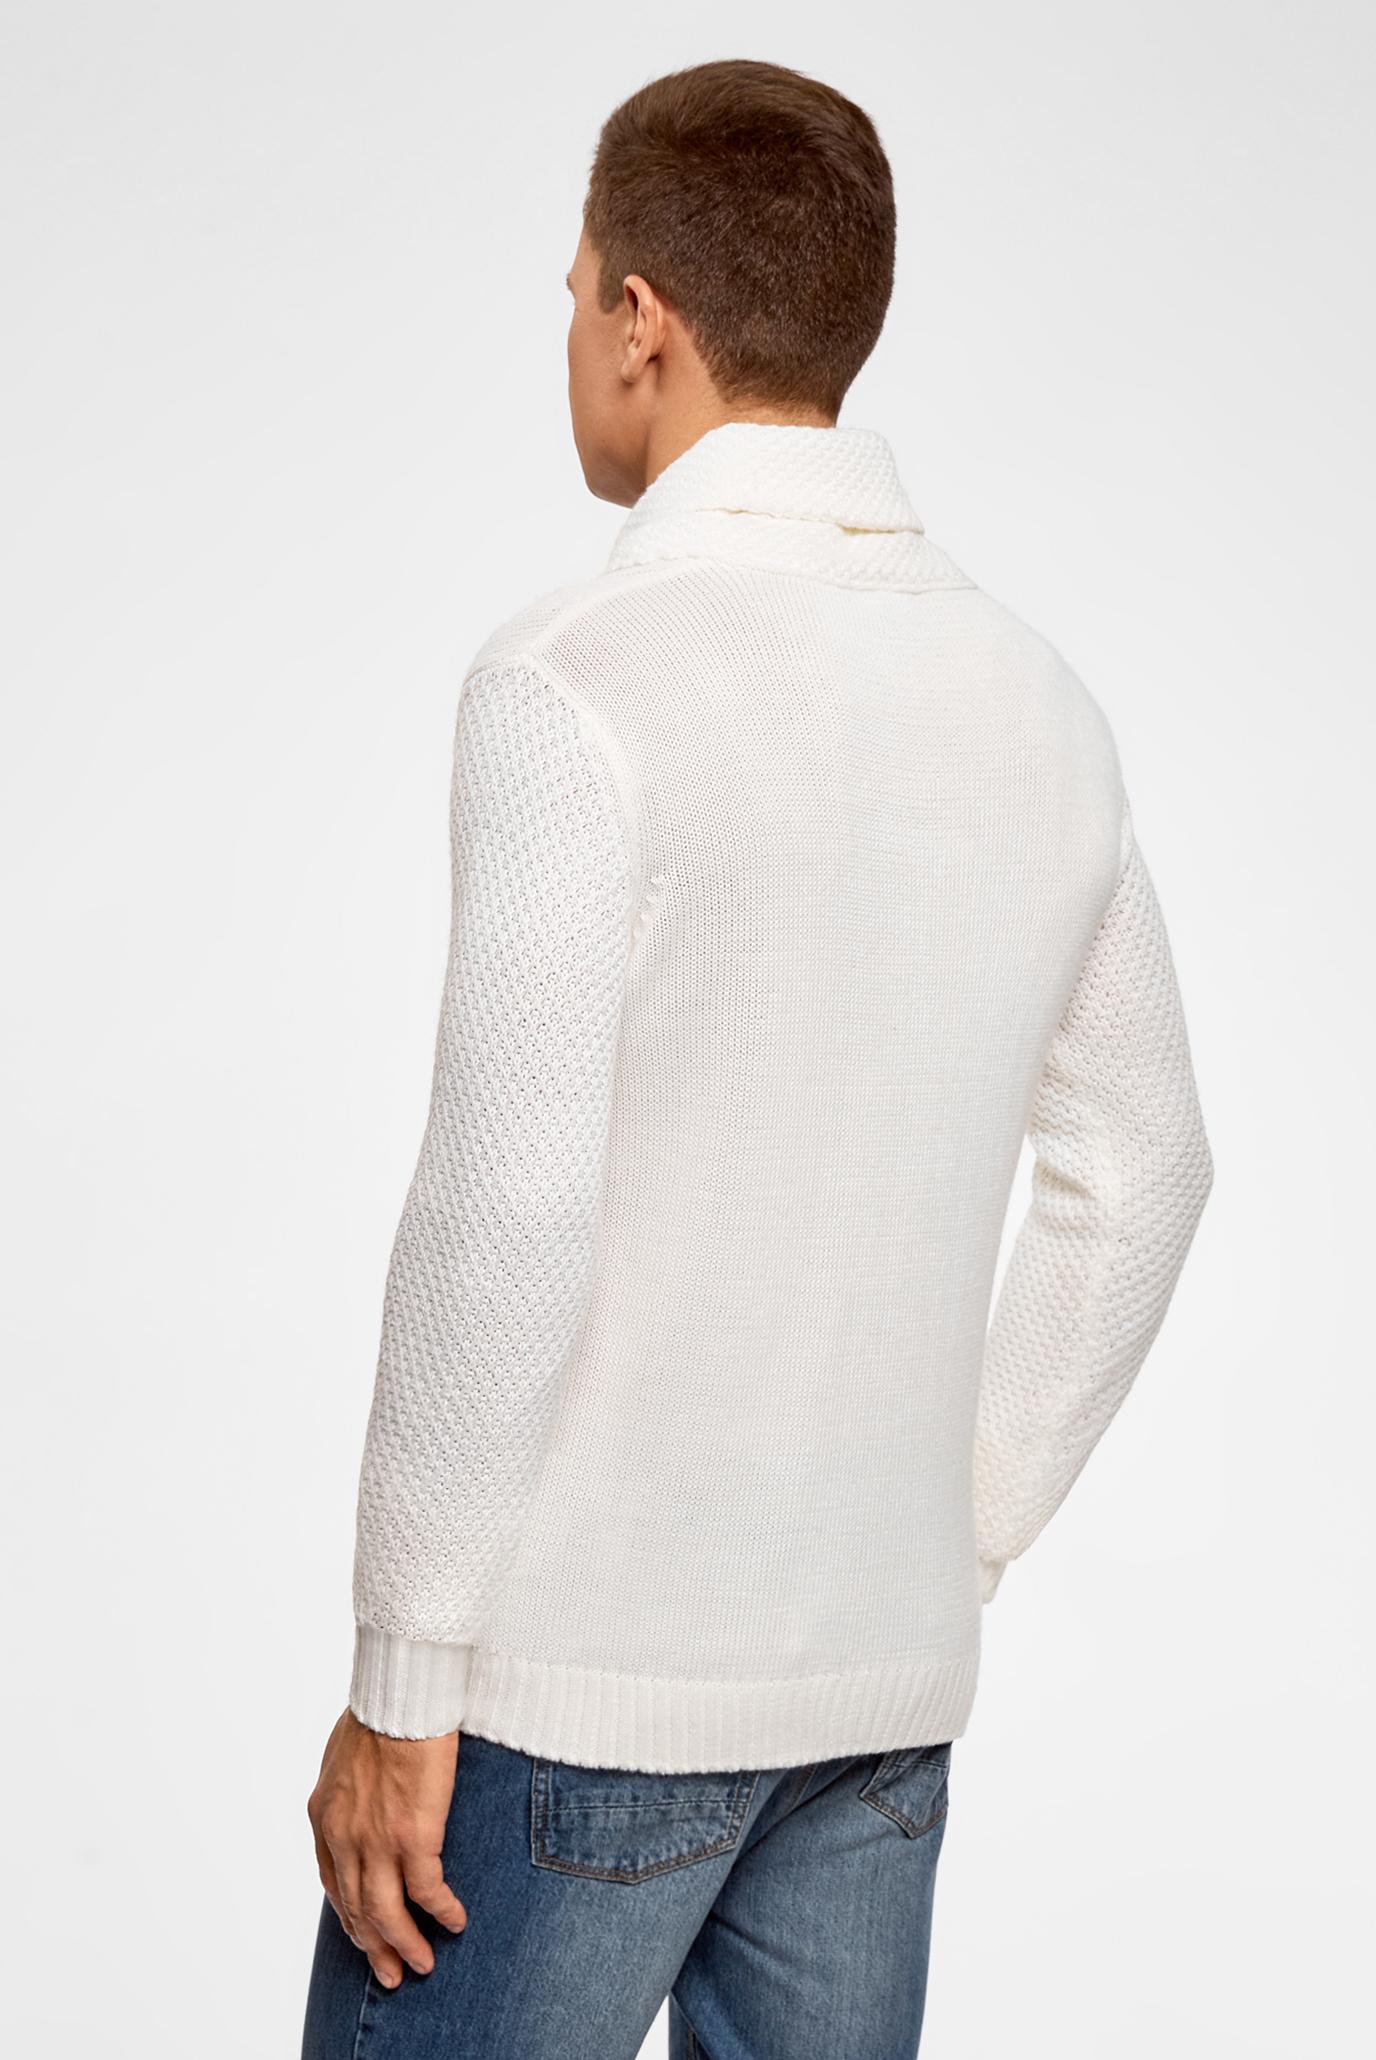 299baa4235e20 Купить Мужской белый свитер Oodji Oodji 4L205019M/44475N/1200N – Киев,  Украина. Цены в интернет магазине MD Fashion